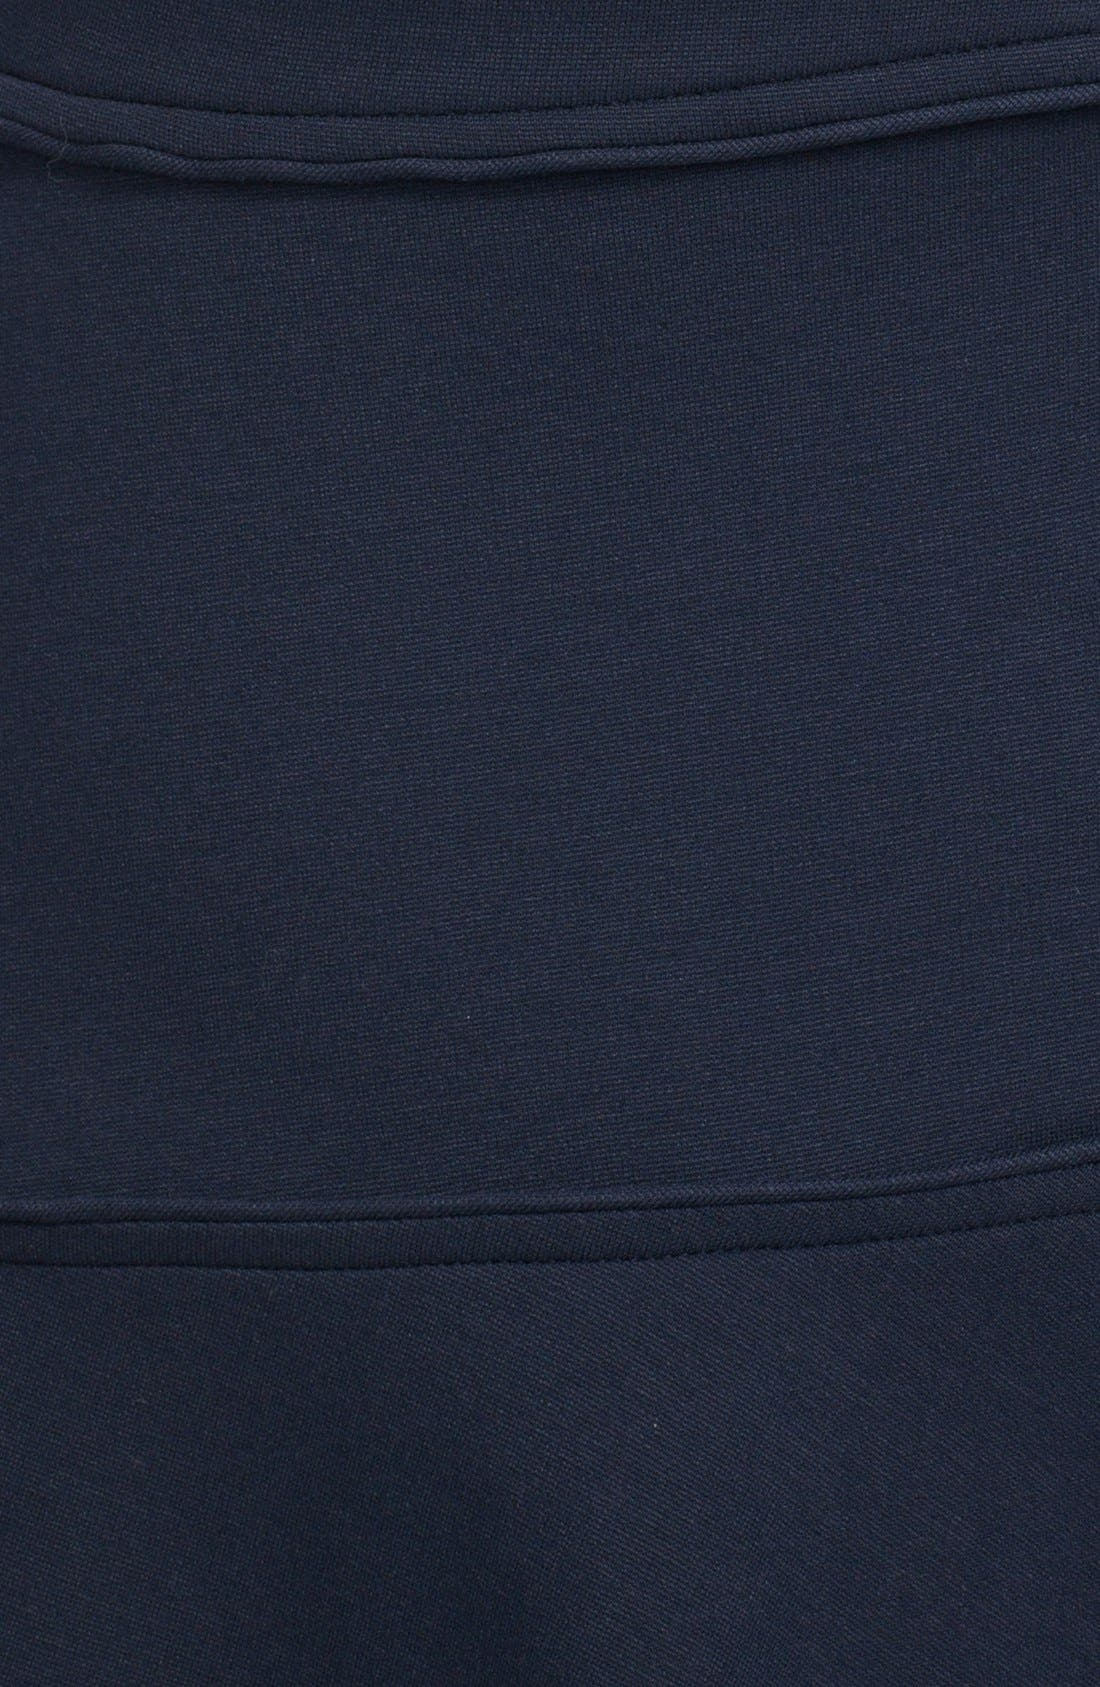 Alternate Image 3  - RED Valentino Interlock Jersey Dress